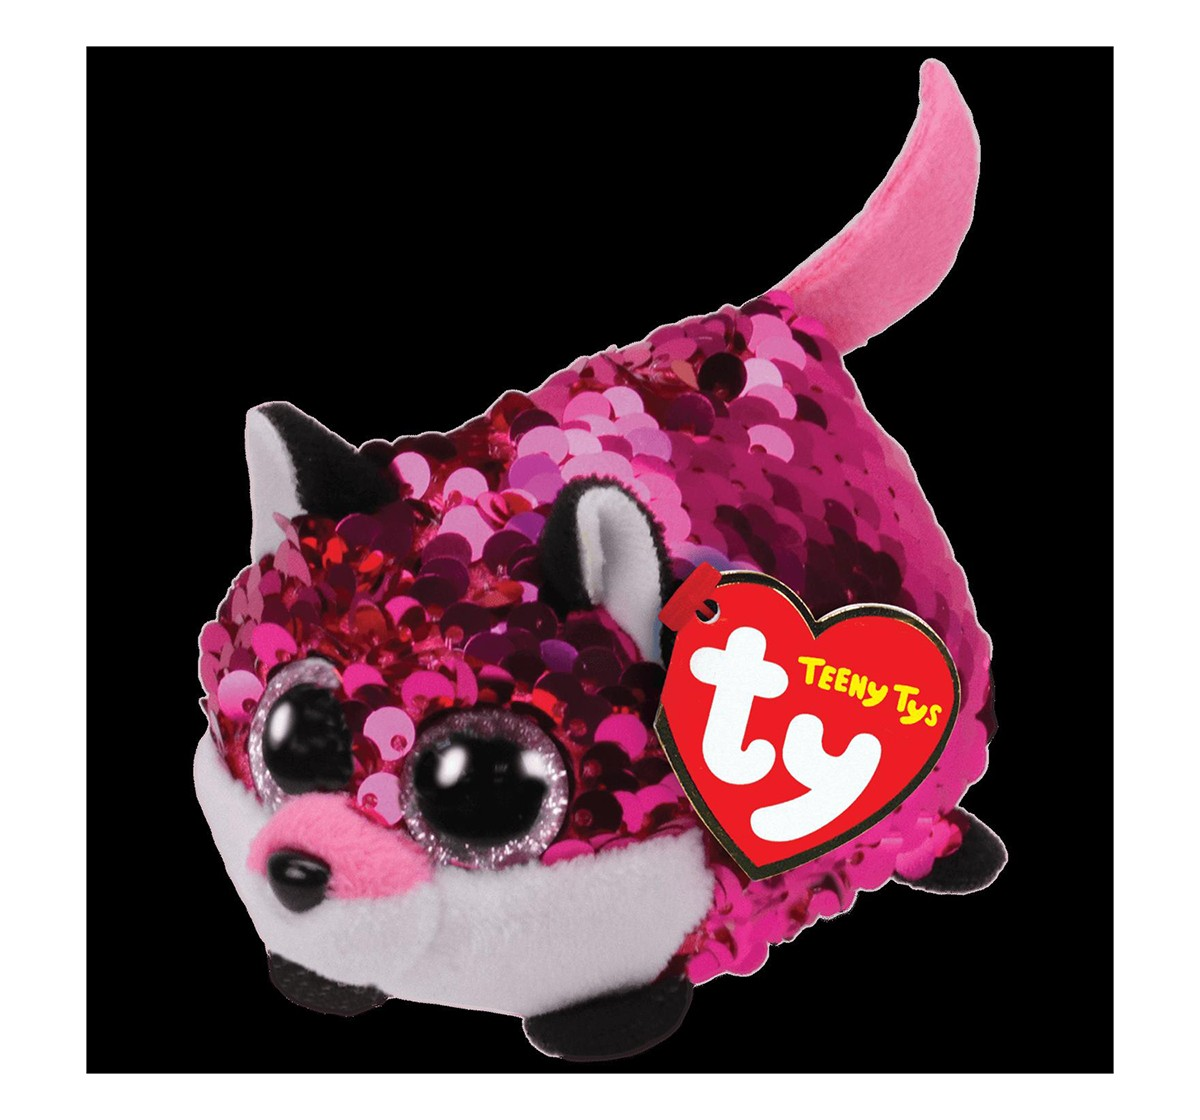 Ty Jewel - Flippables Fox Teeny Ty Novelty for Kids age 3Y+ - 10 Cm